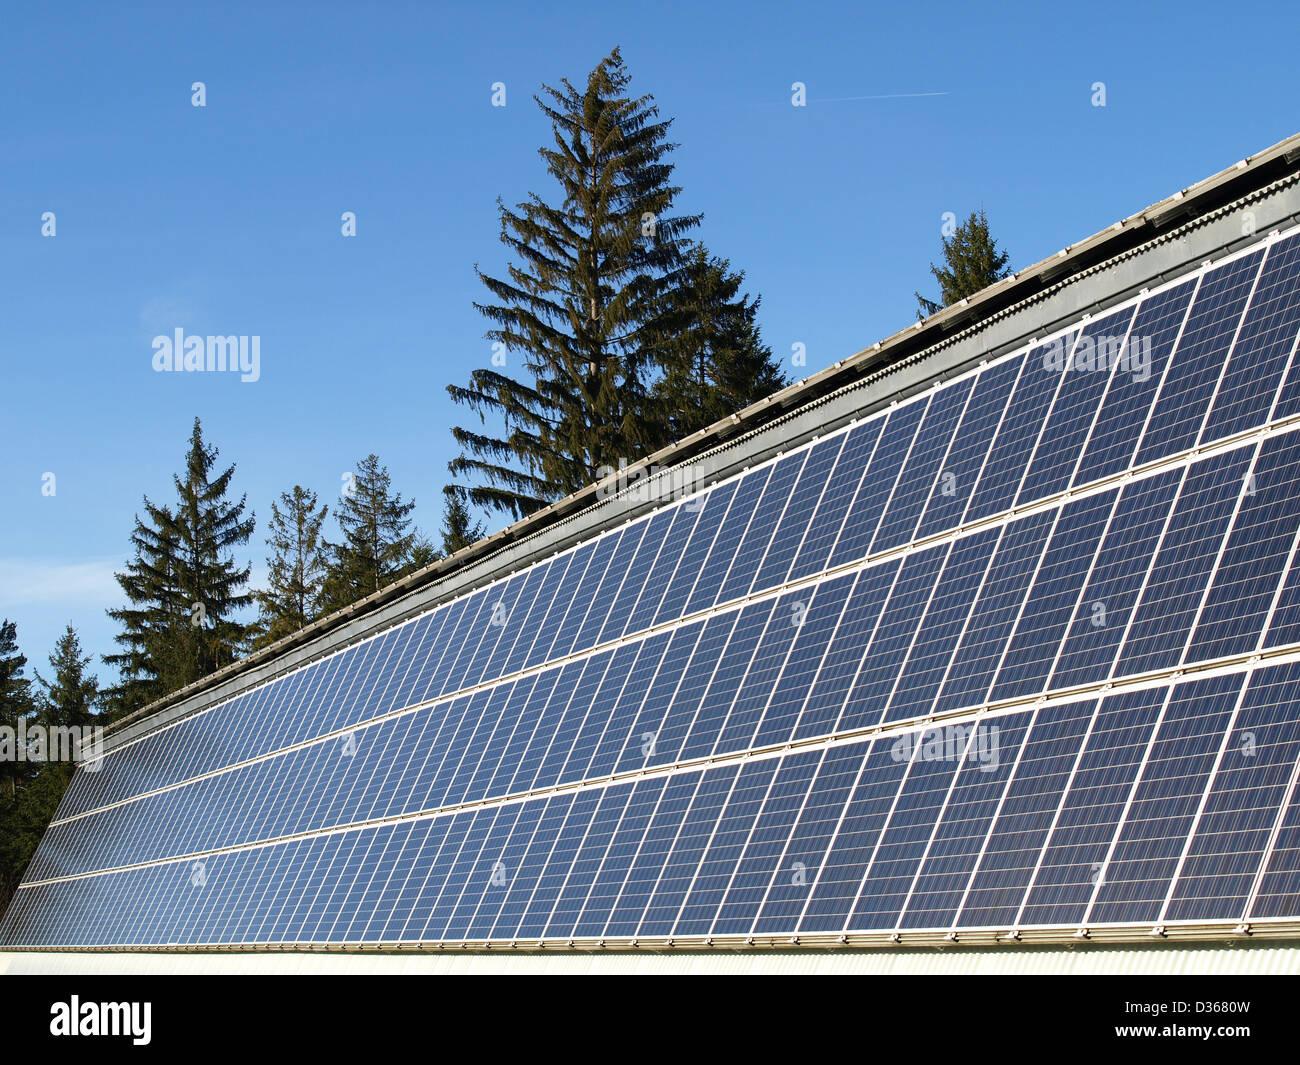 solar cells / Solarzellen - Stock Image